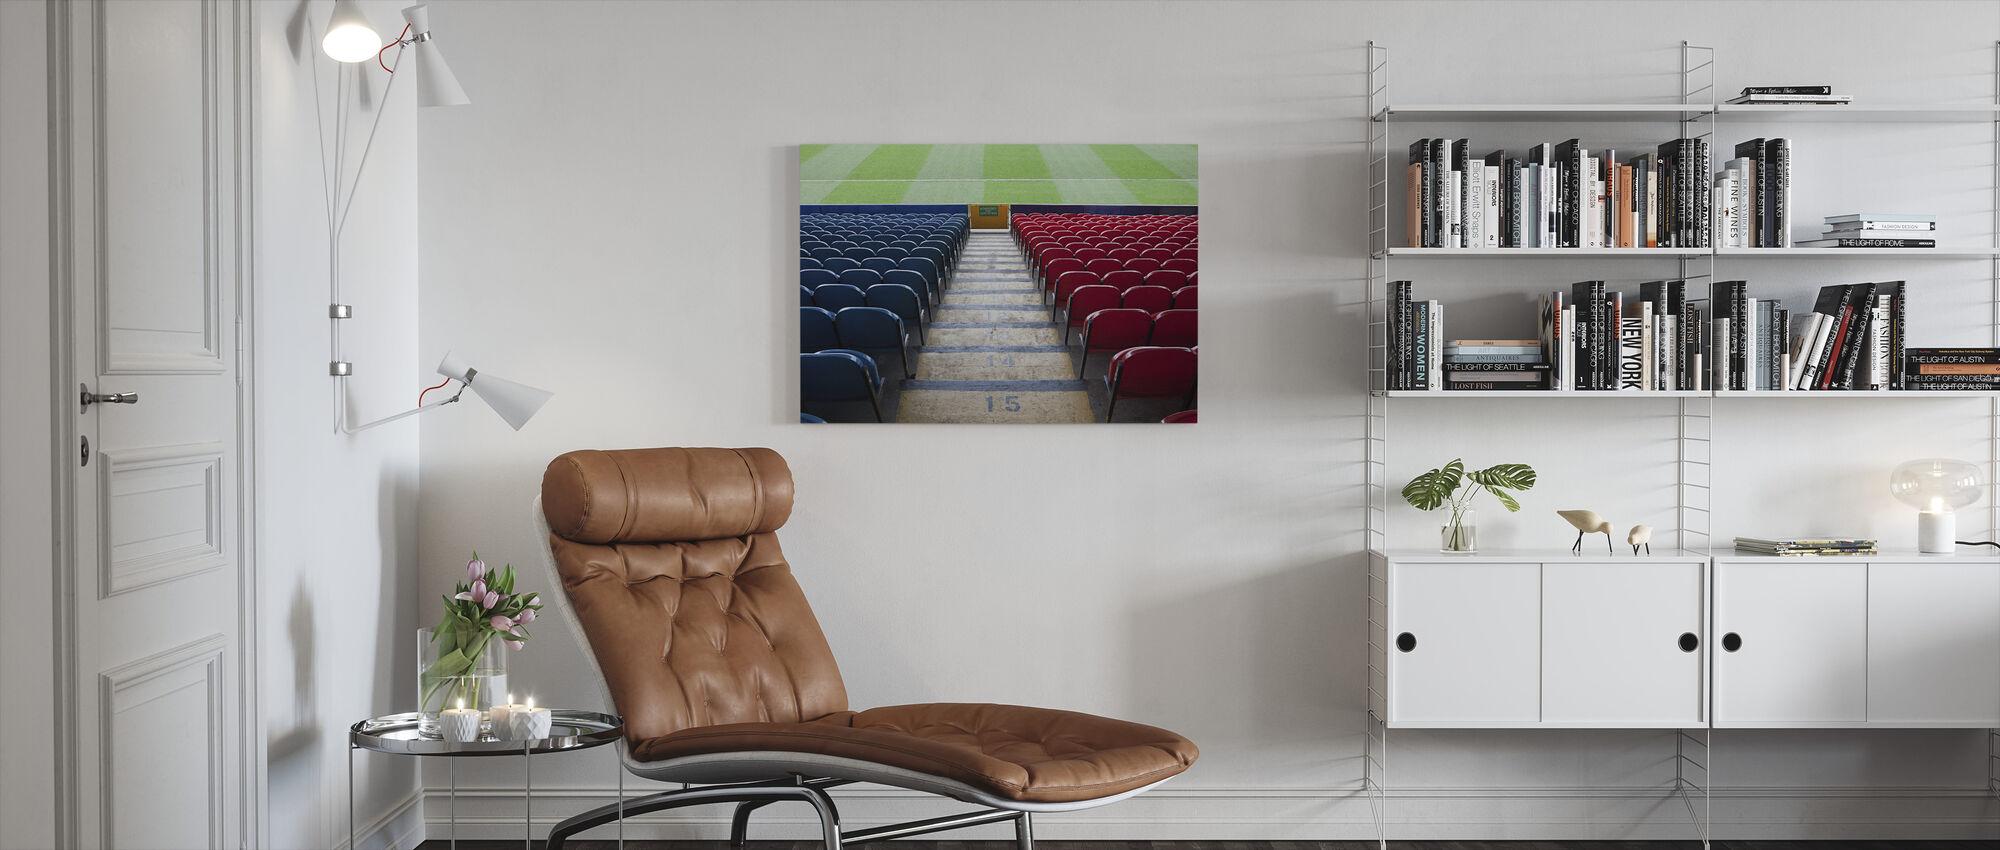 Tomma stadion - Canvastavla - Vardagsrum